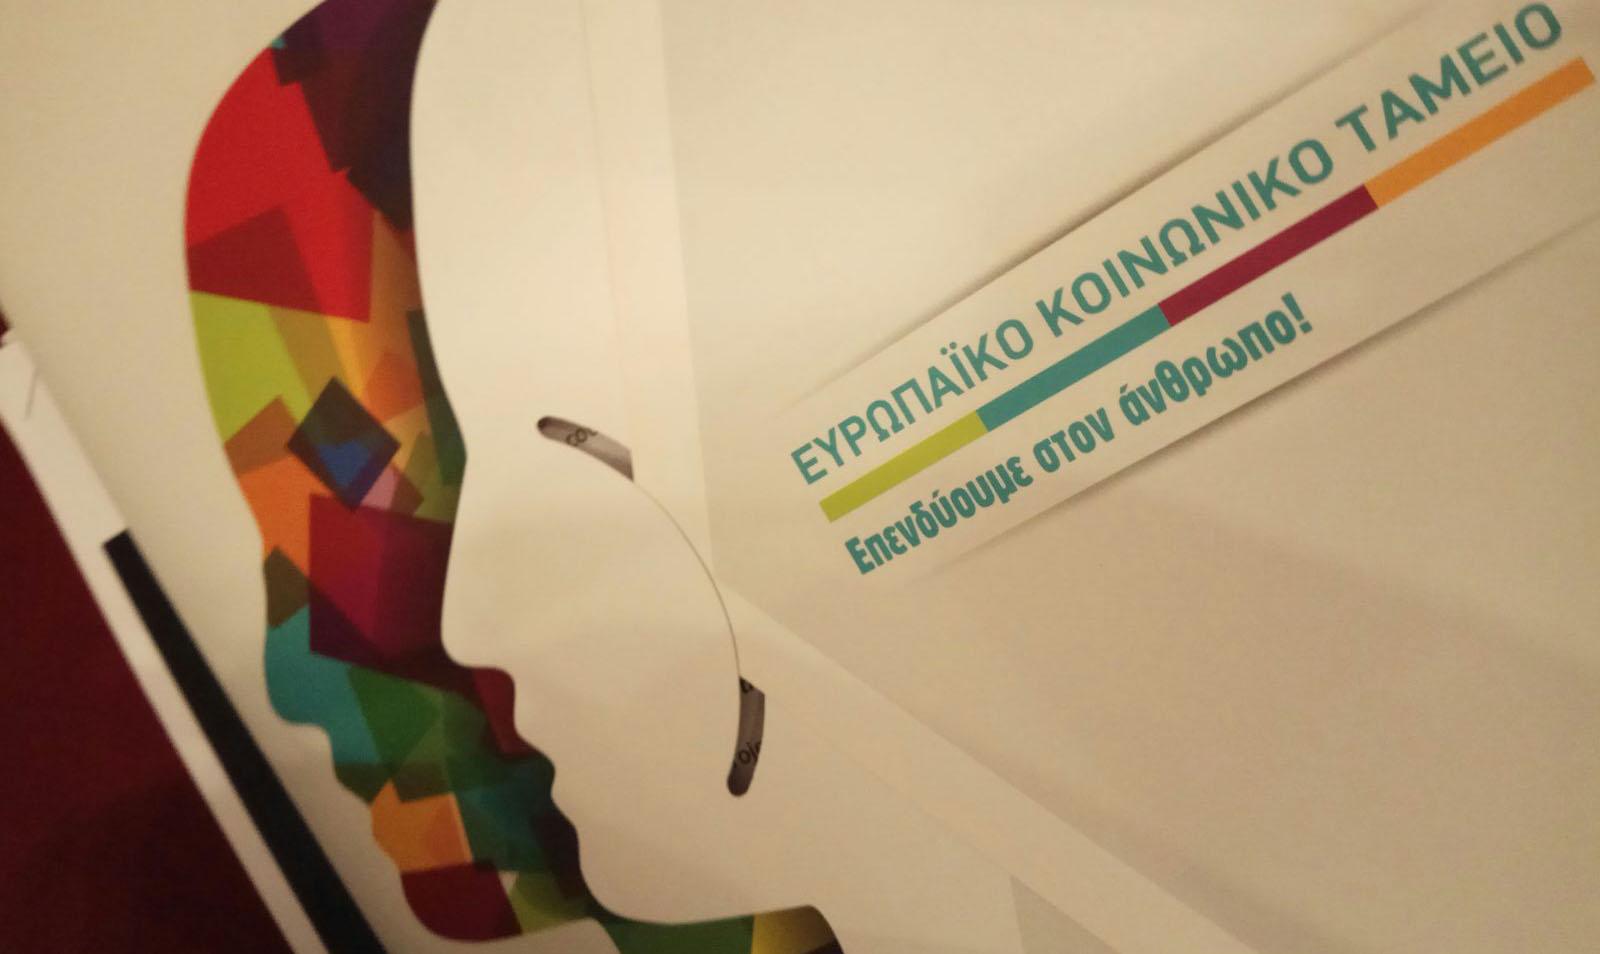 InnÓrbita participa en una Red Europea de Empleo